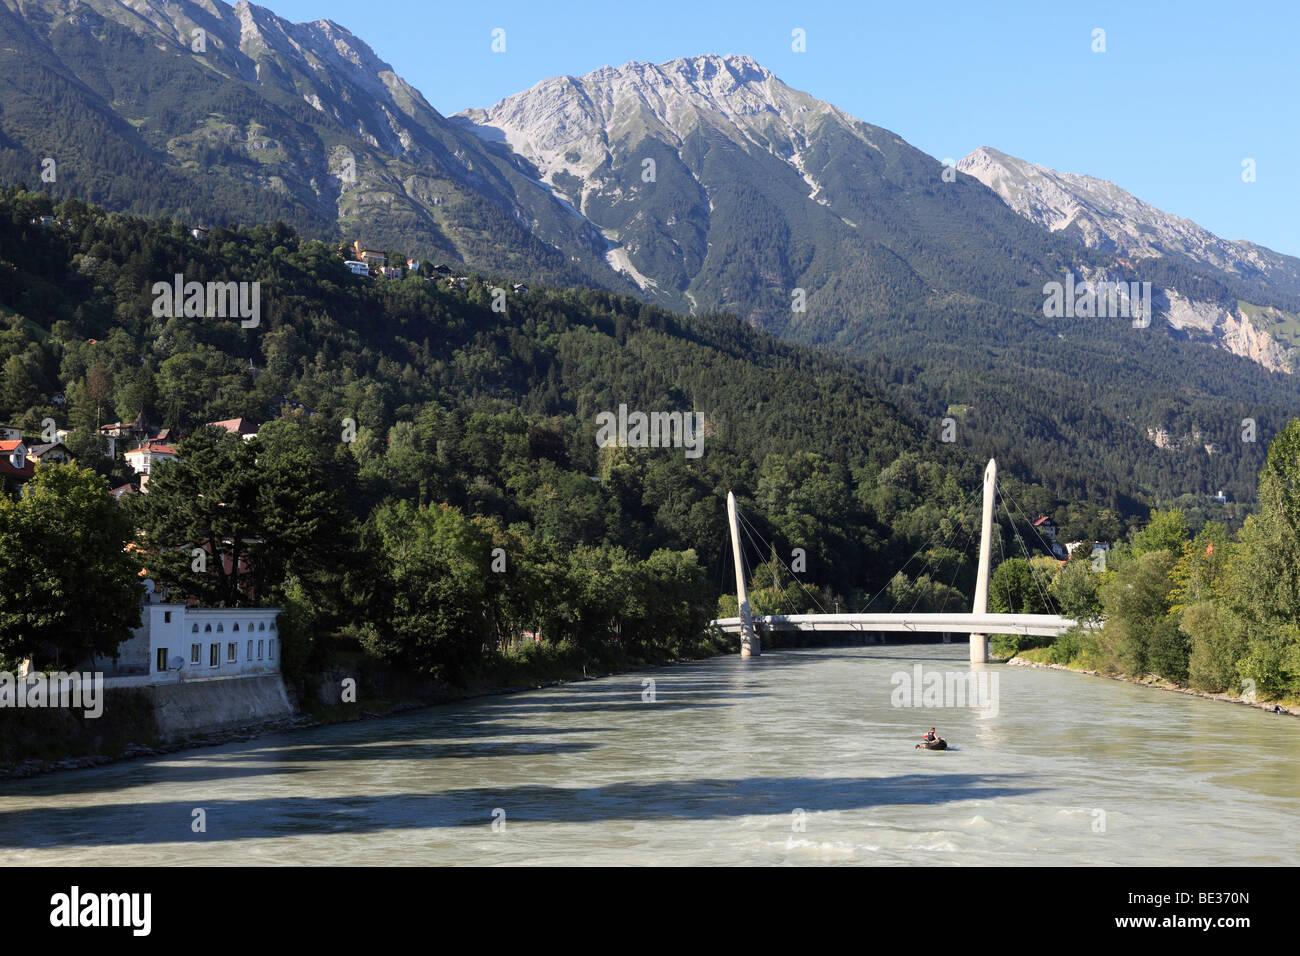 Inn River with a bridge of the Hungerburgbahn railway, Innsbruck, Tyrol, Austria, Europe - Stock Image